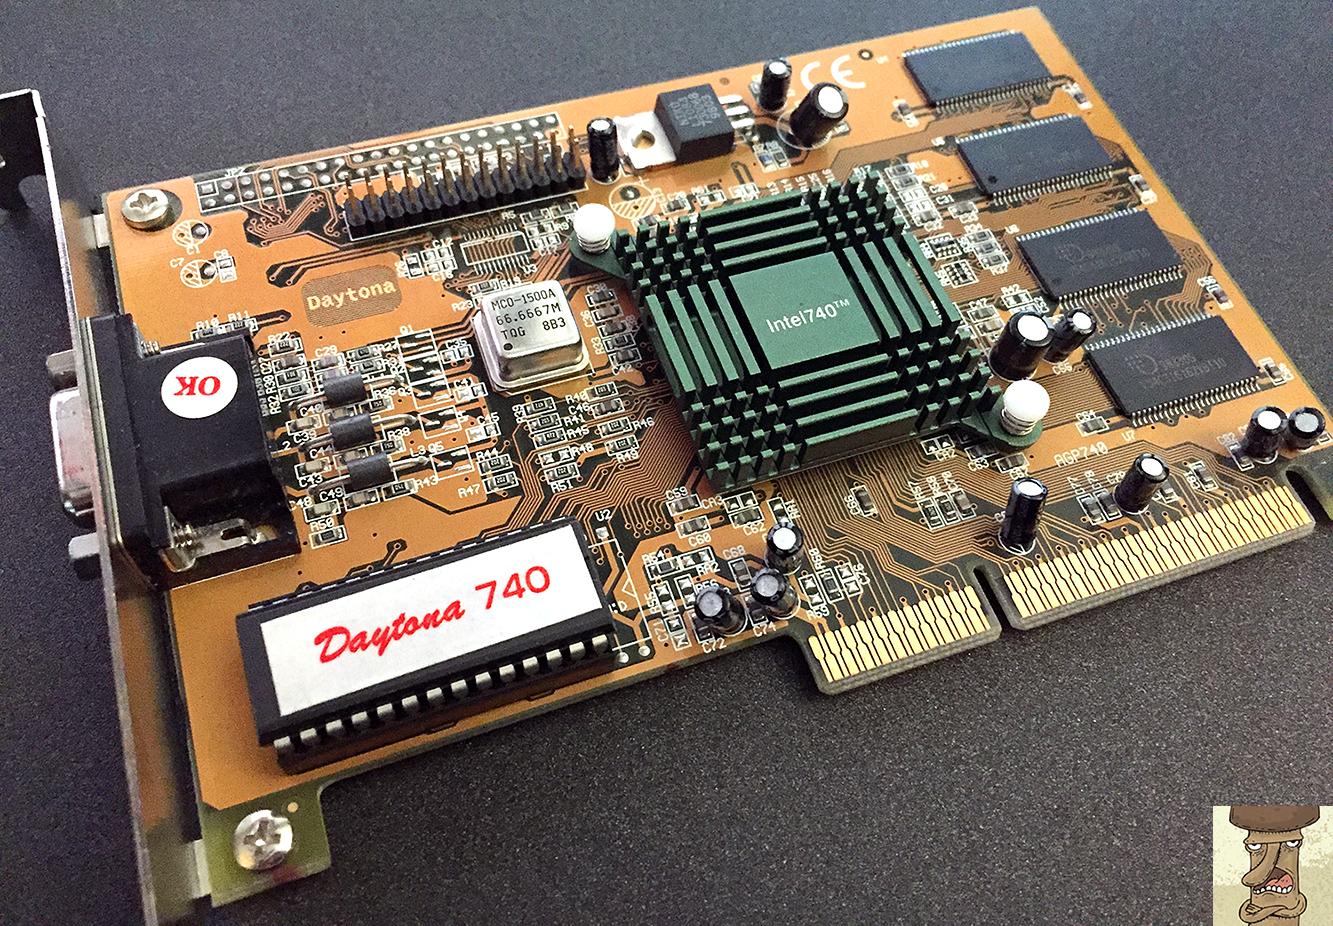 BATYRA_Intel740_Daytona_8MB.jpg